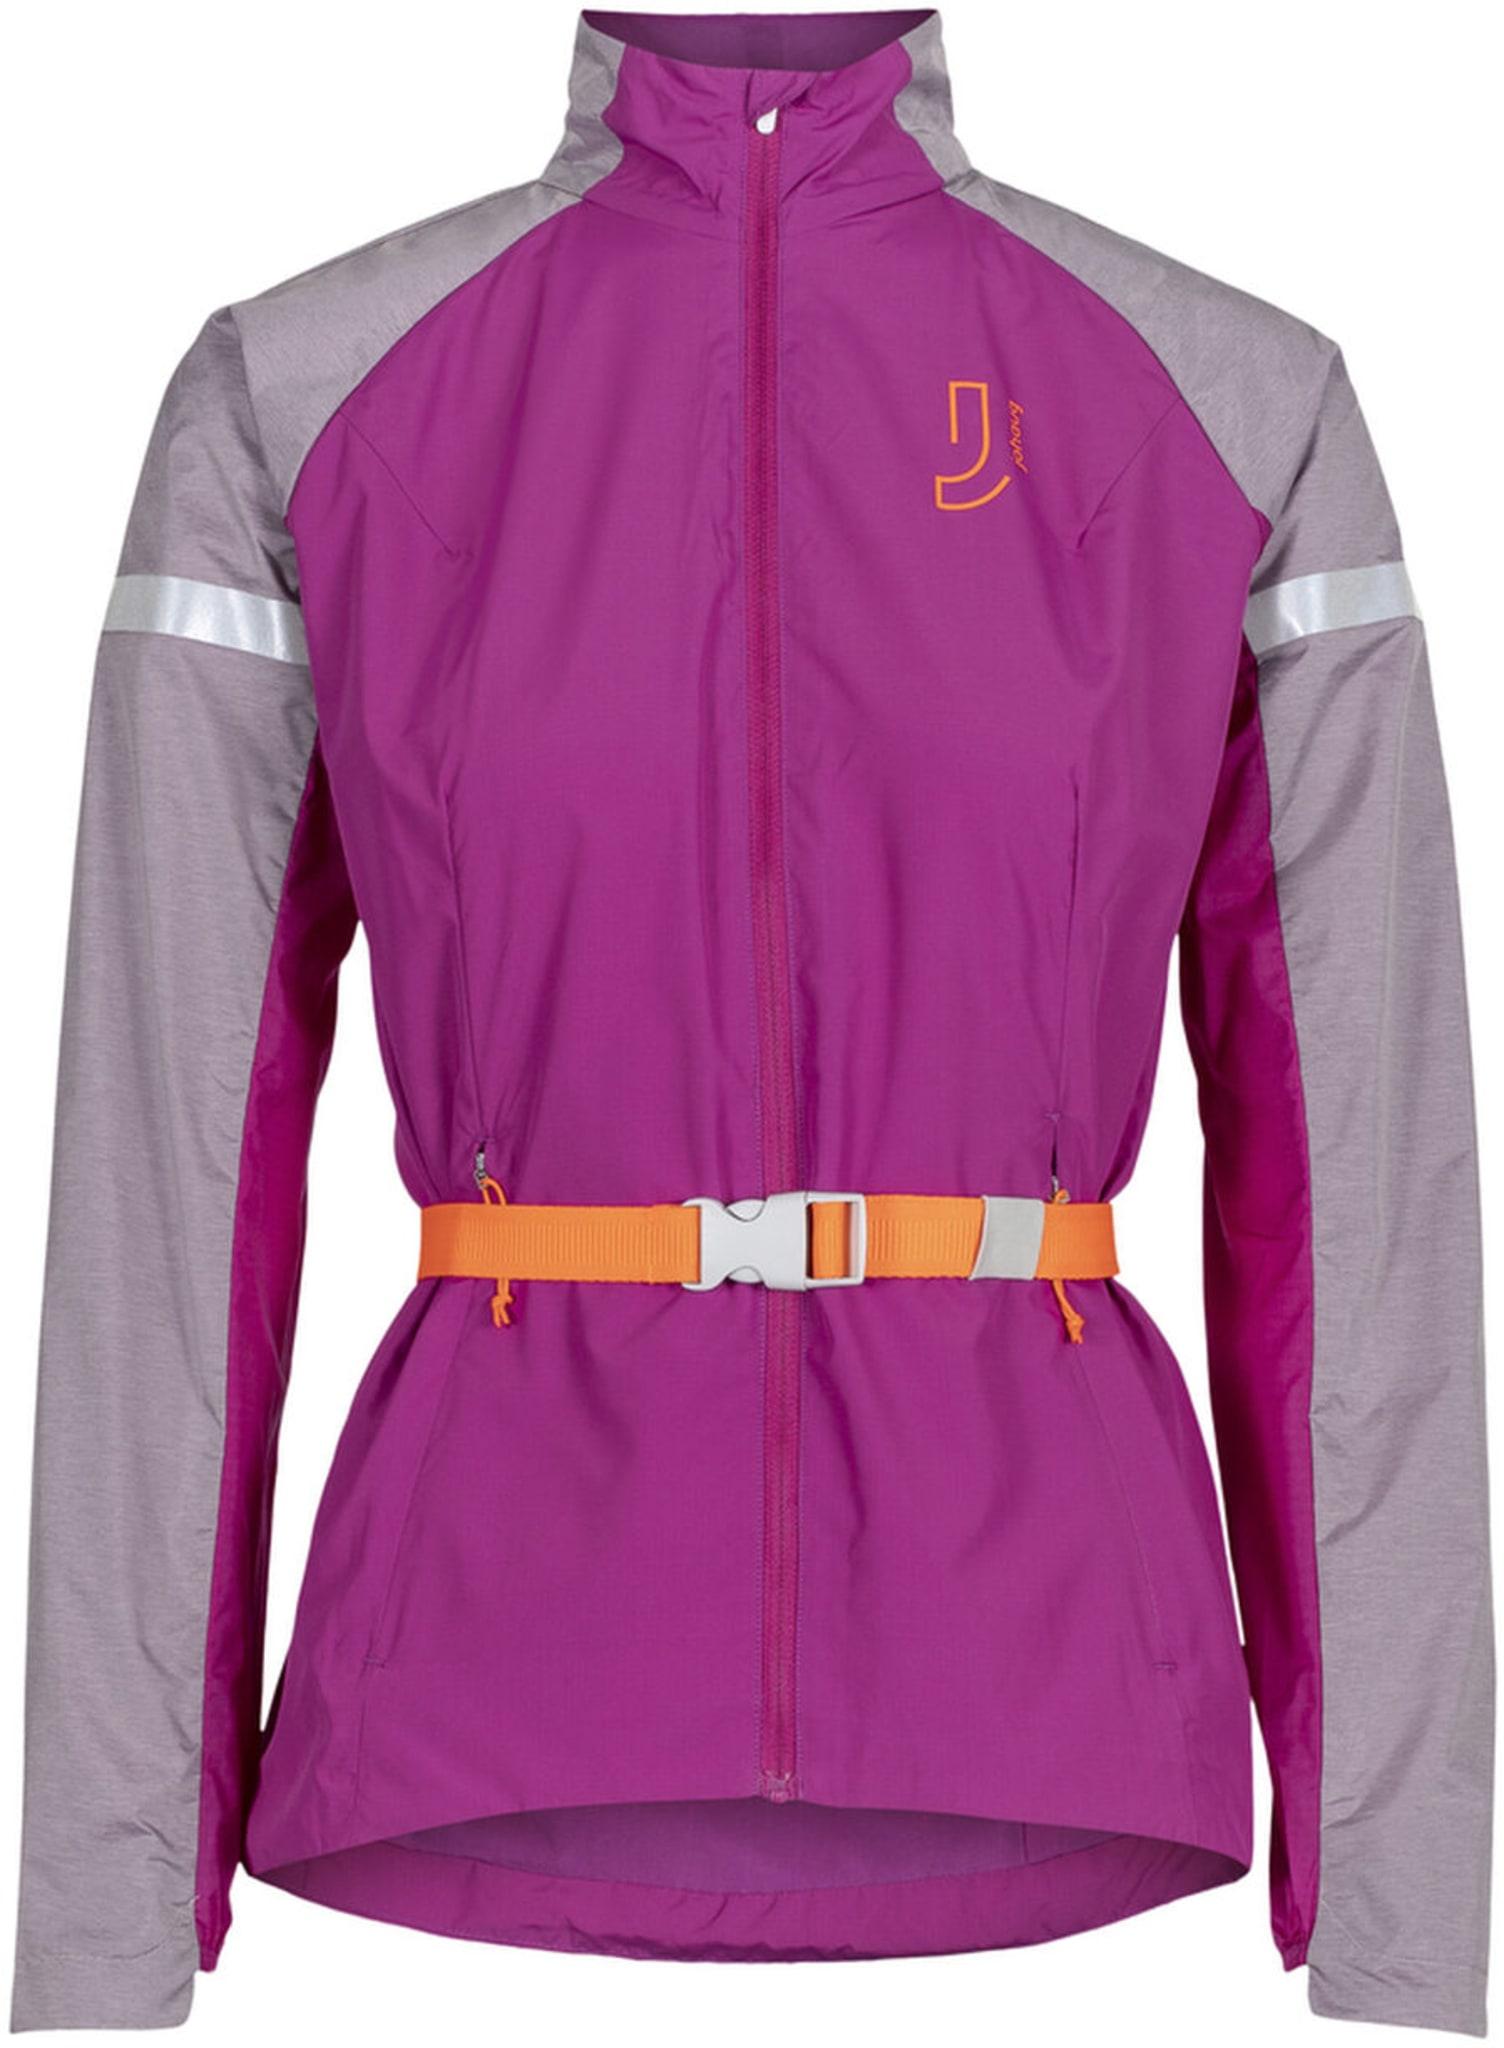 Buoyant Packable Jacket